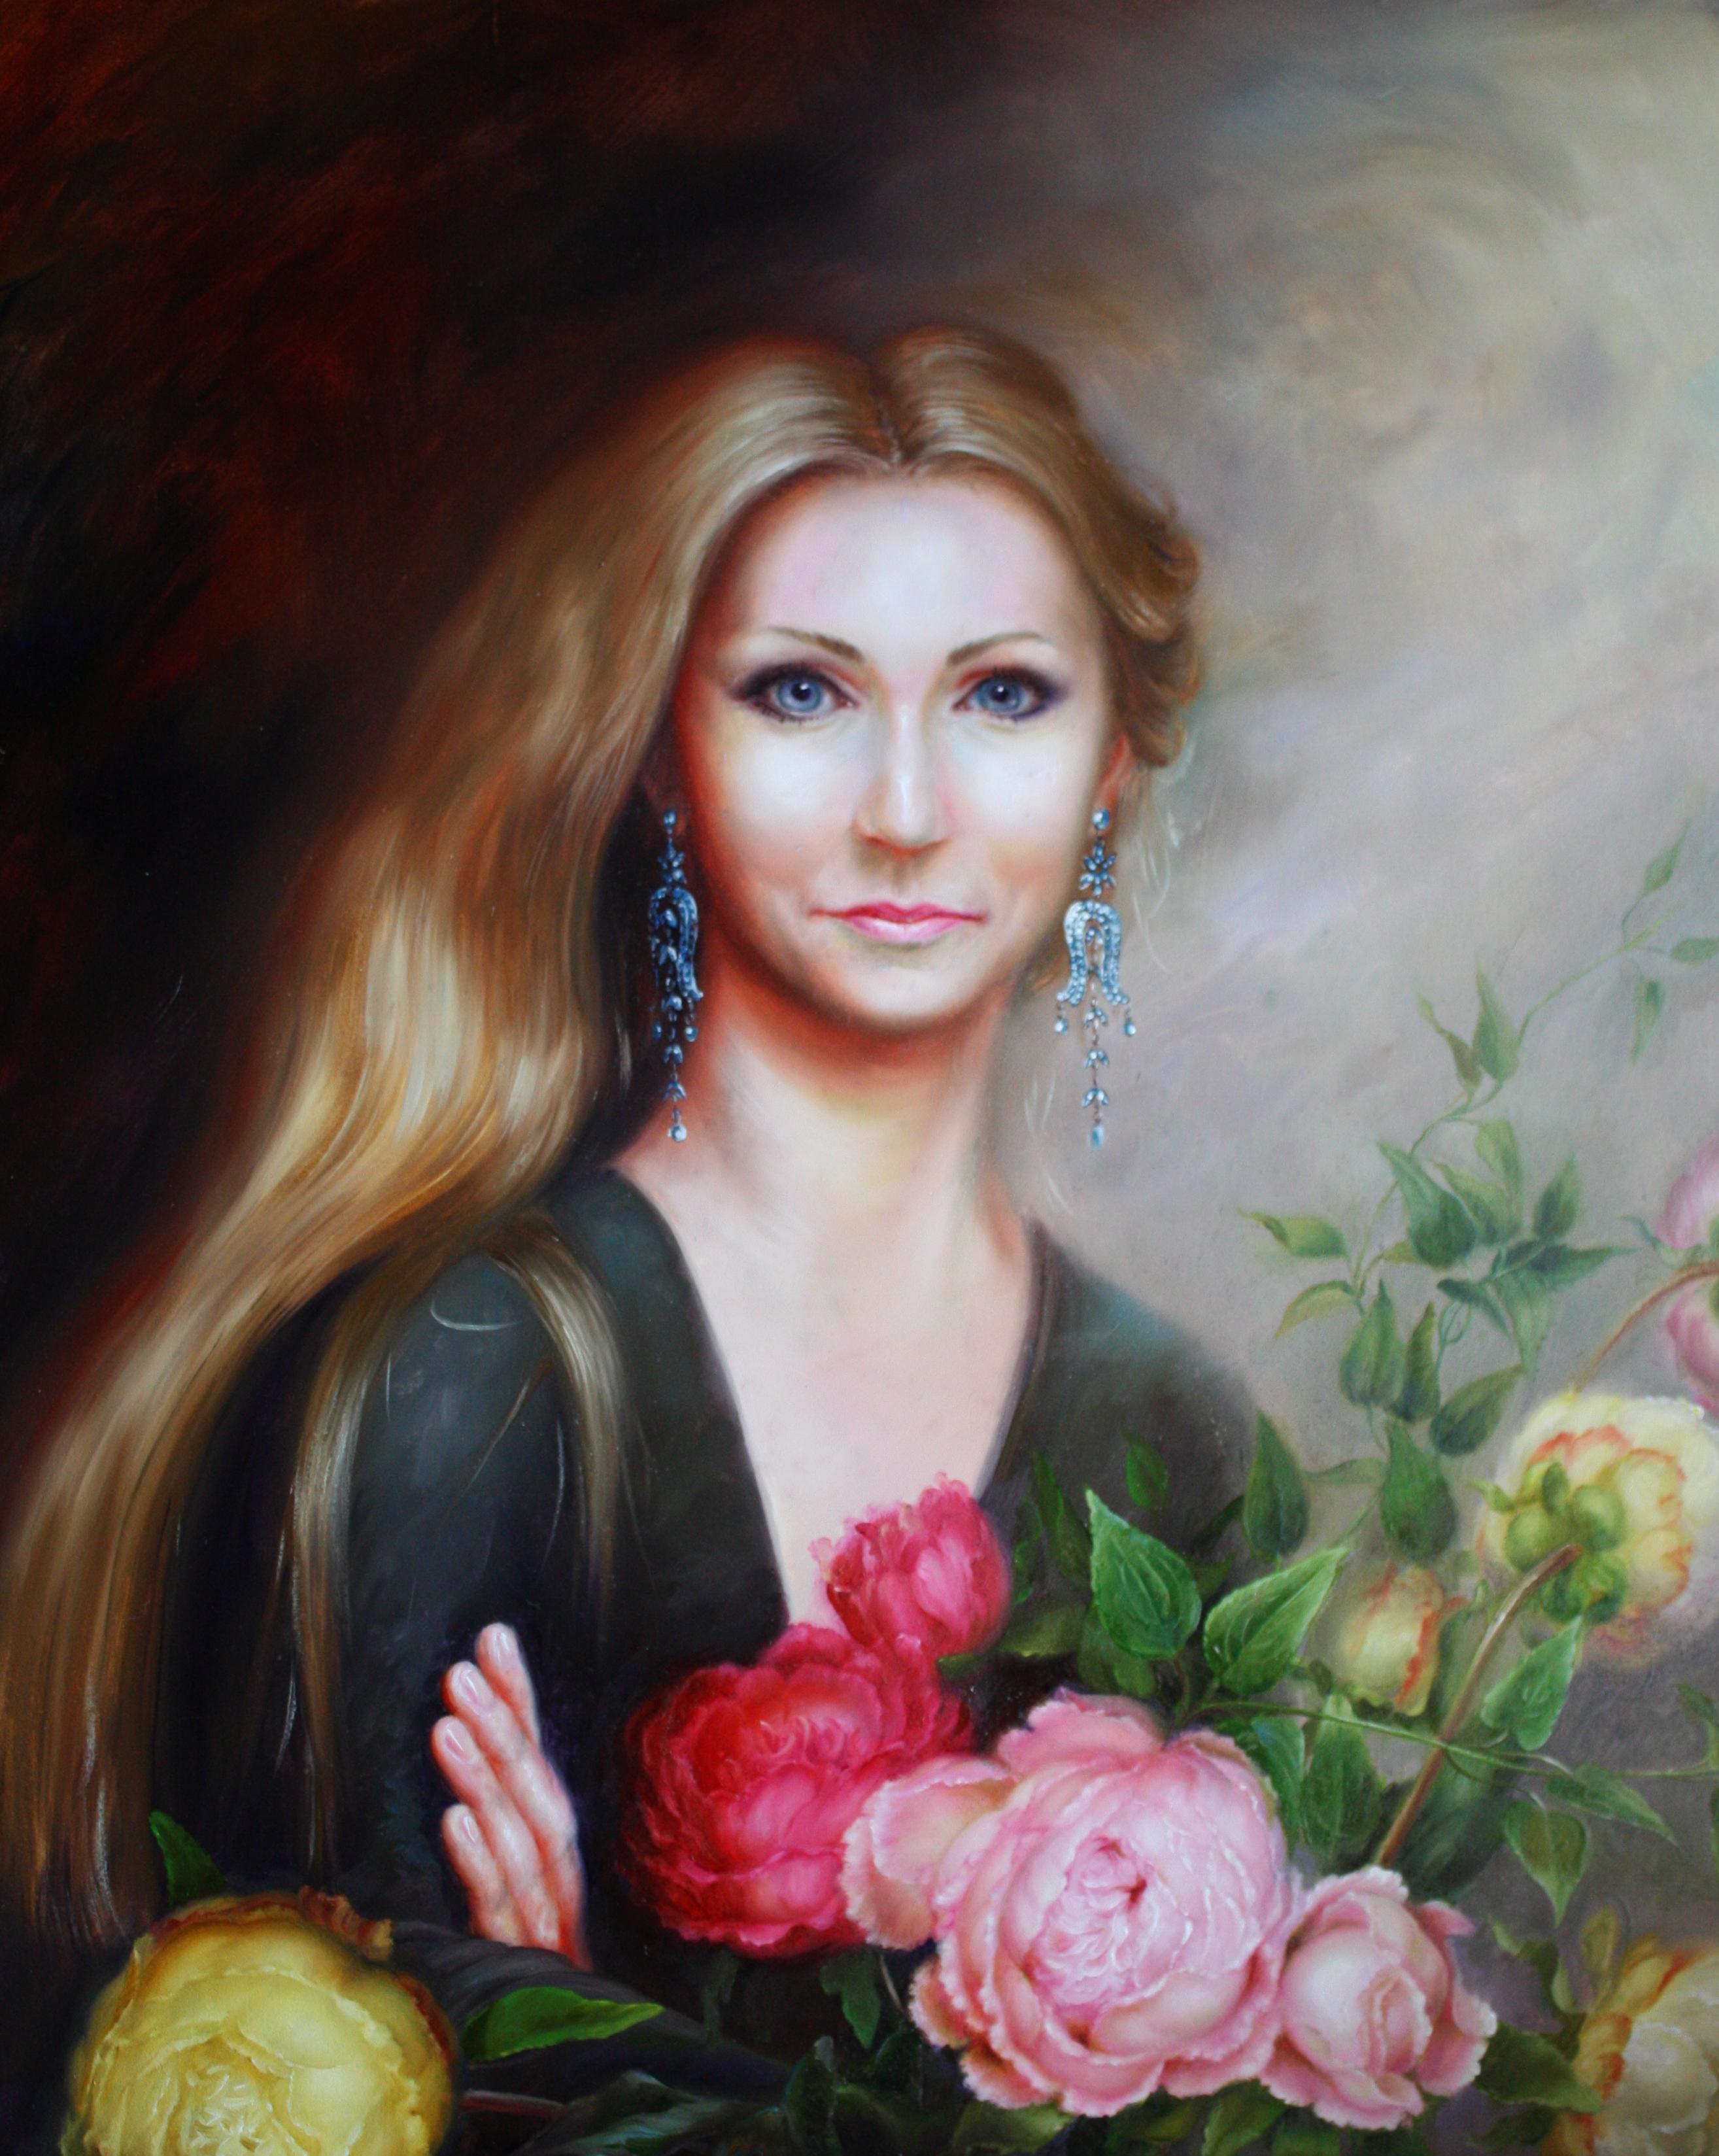 Paintist's Wife